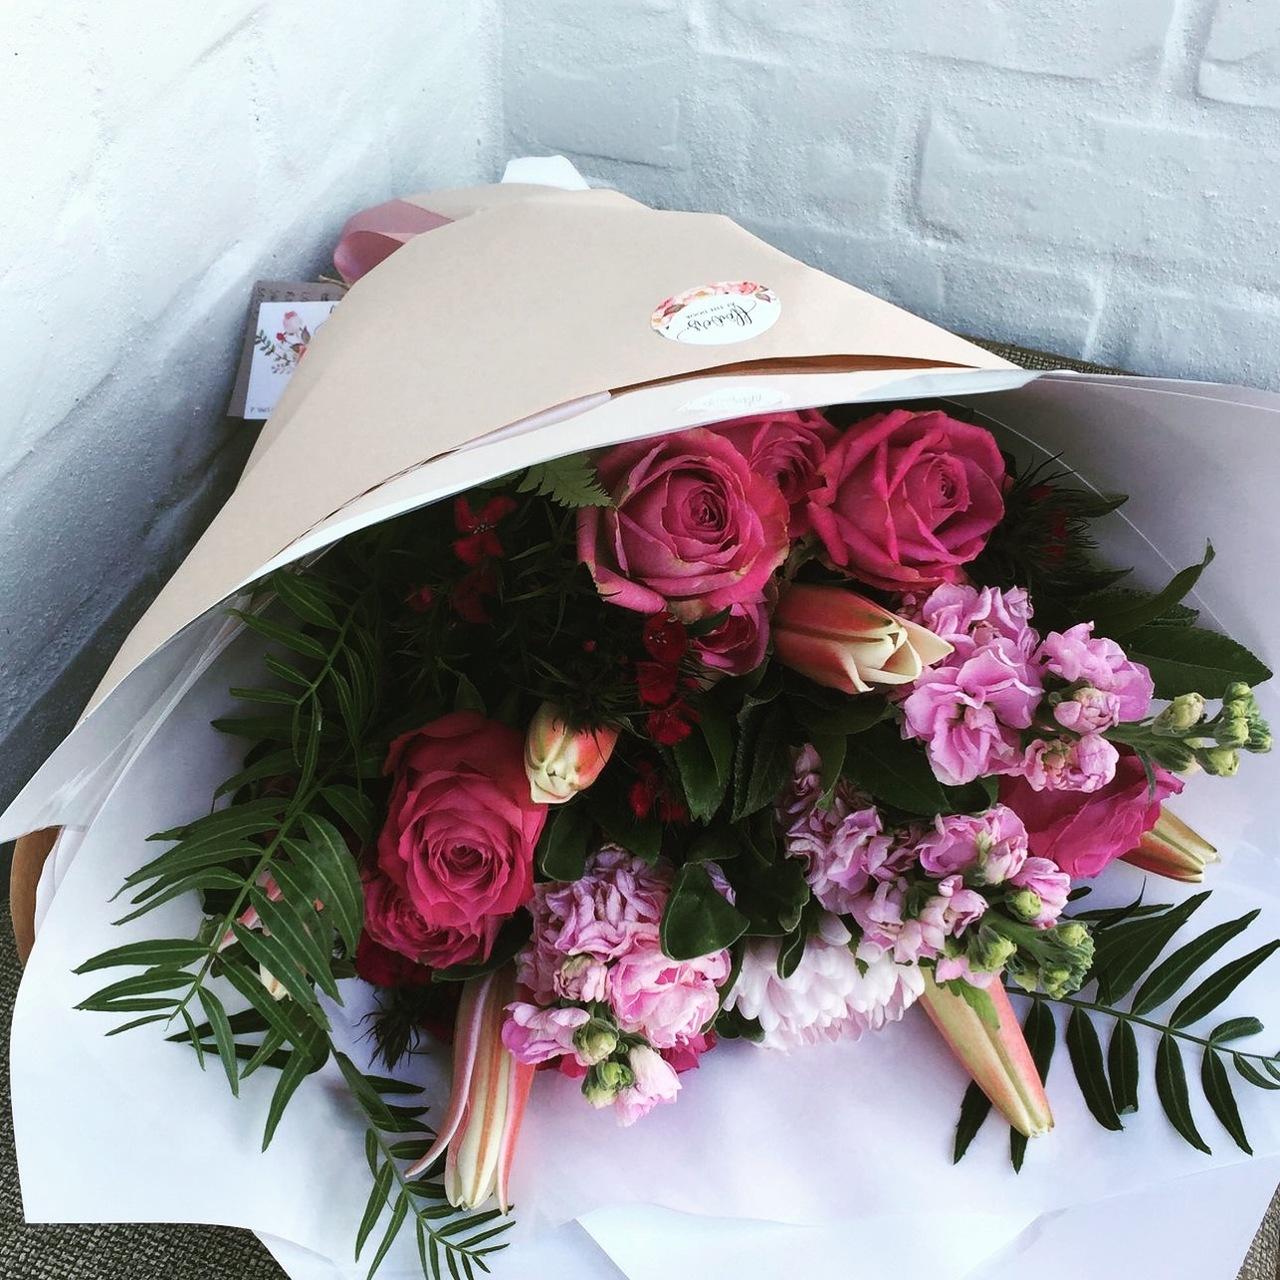 Seasonal Vintage Bouquet of Flowers